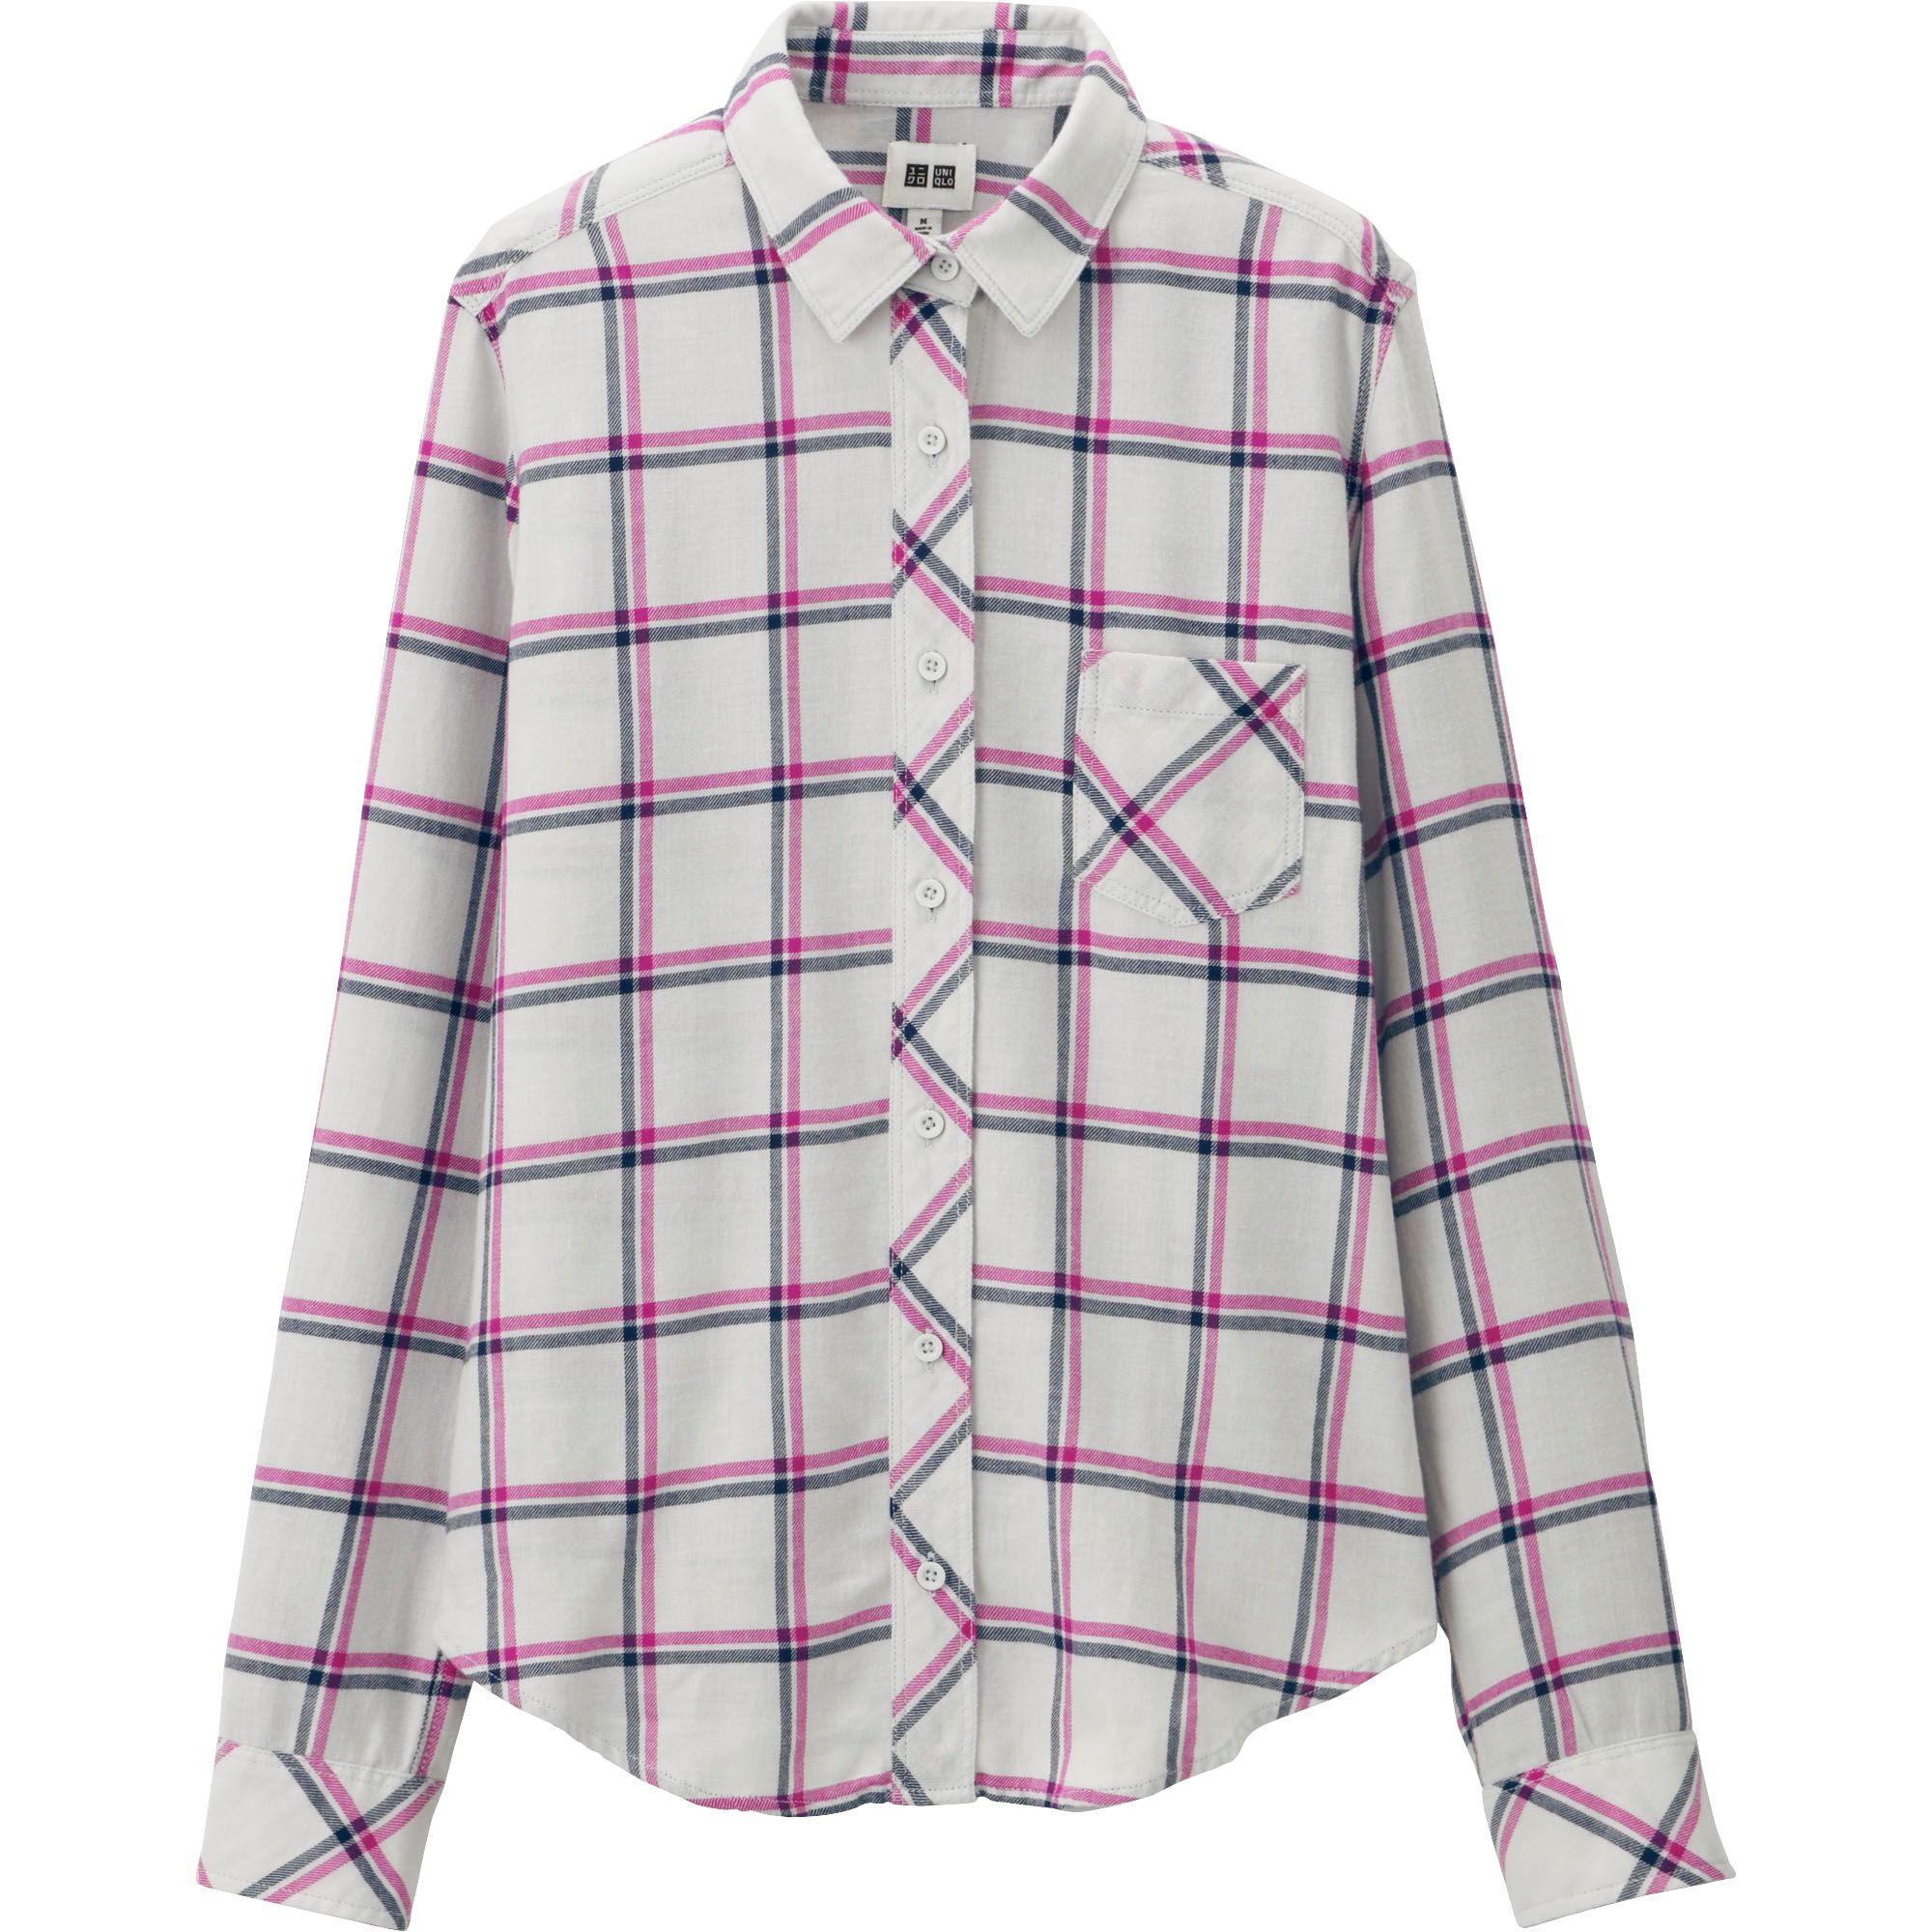 Uniqlo Women Light Flannel Long Sleeve Shirt In Pink